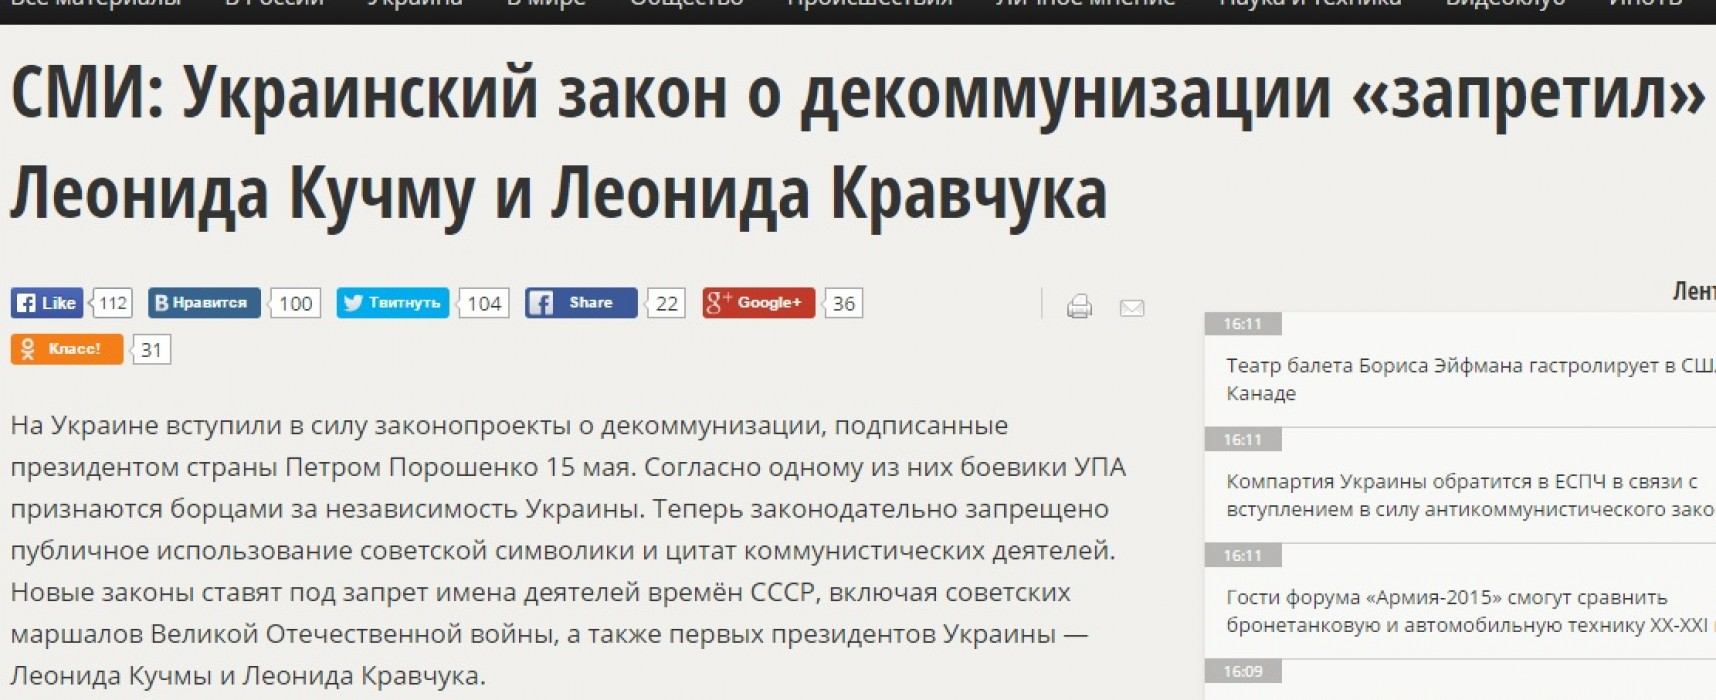 Фейк: Украинский закон о декоммунизации «запретил» Леонида Кучму и Леонида Кравчука